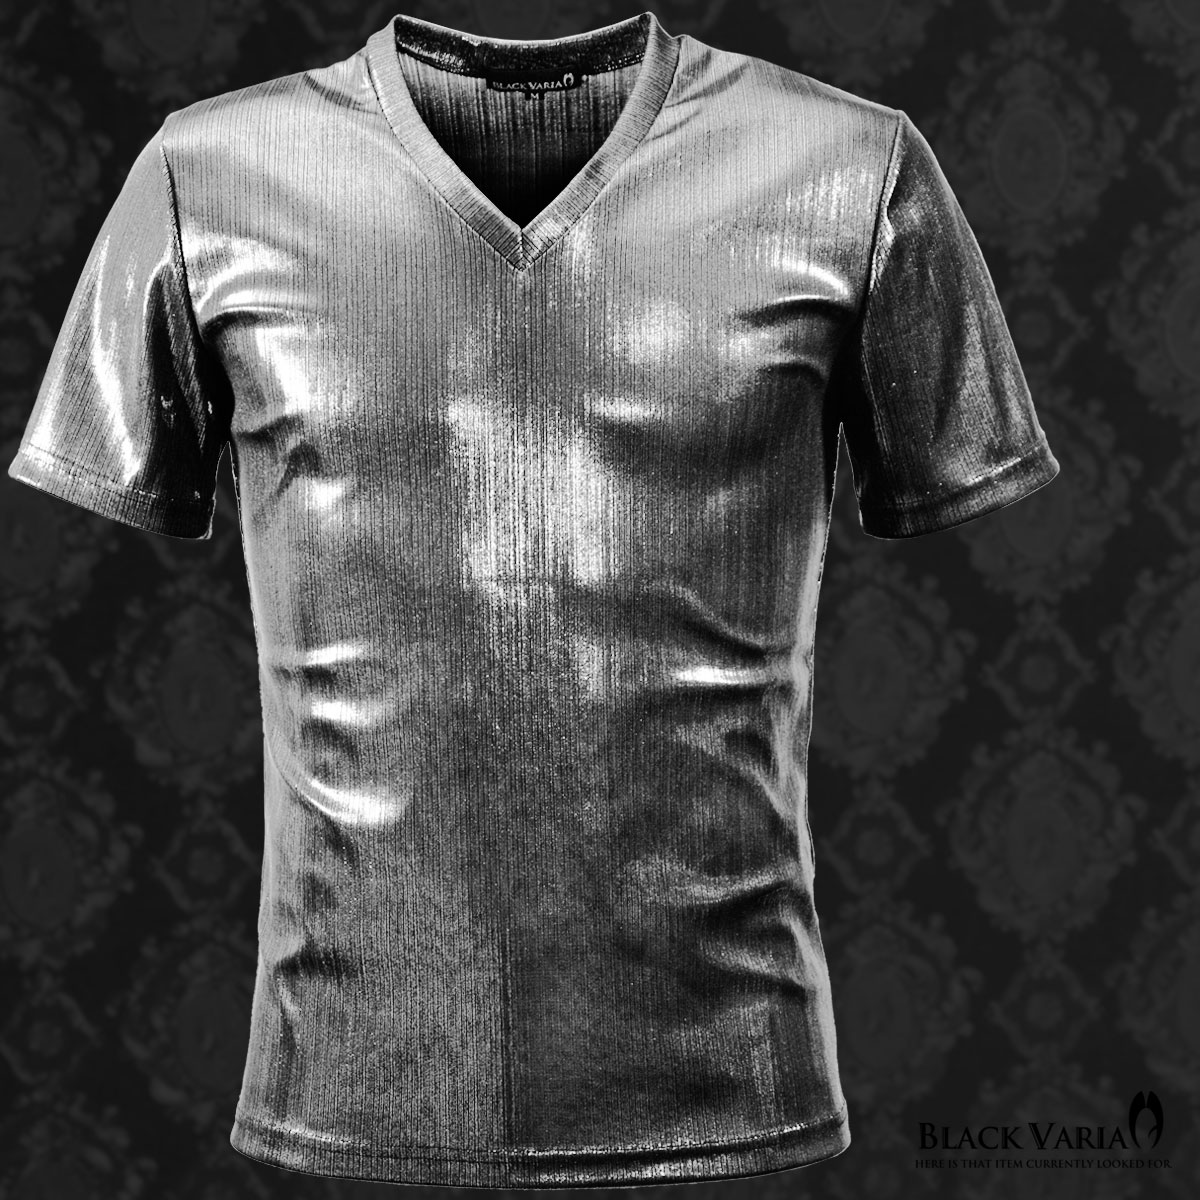 Tシャツ ラメ ストライプ Vネック 半袖 メンズ 日本製 細身 無地 光沢 箔プリント 半袖Tシャツ(シルバー銀)